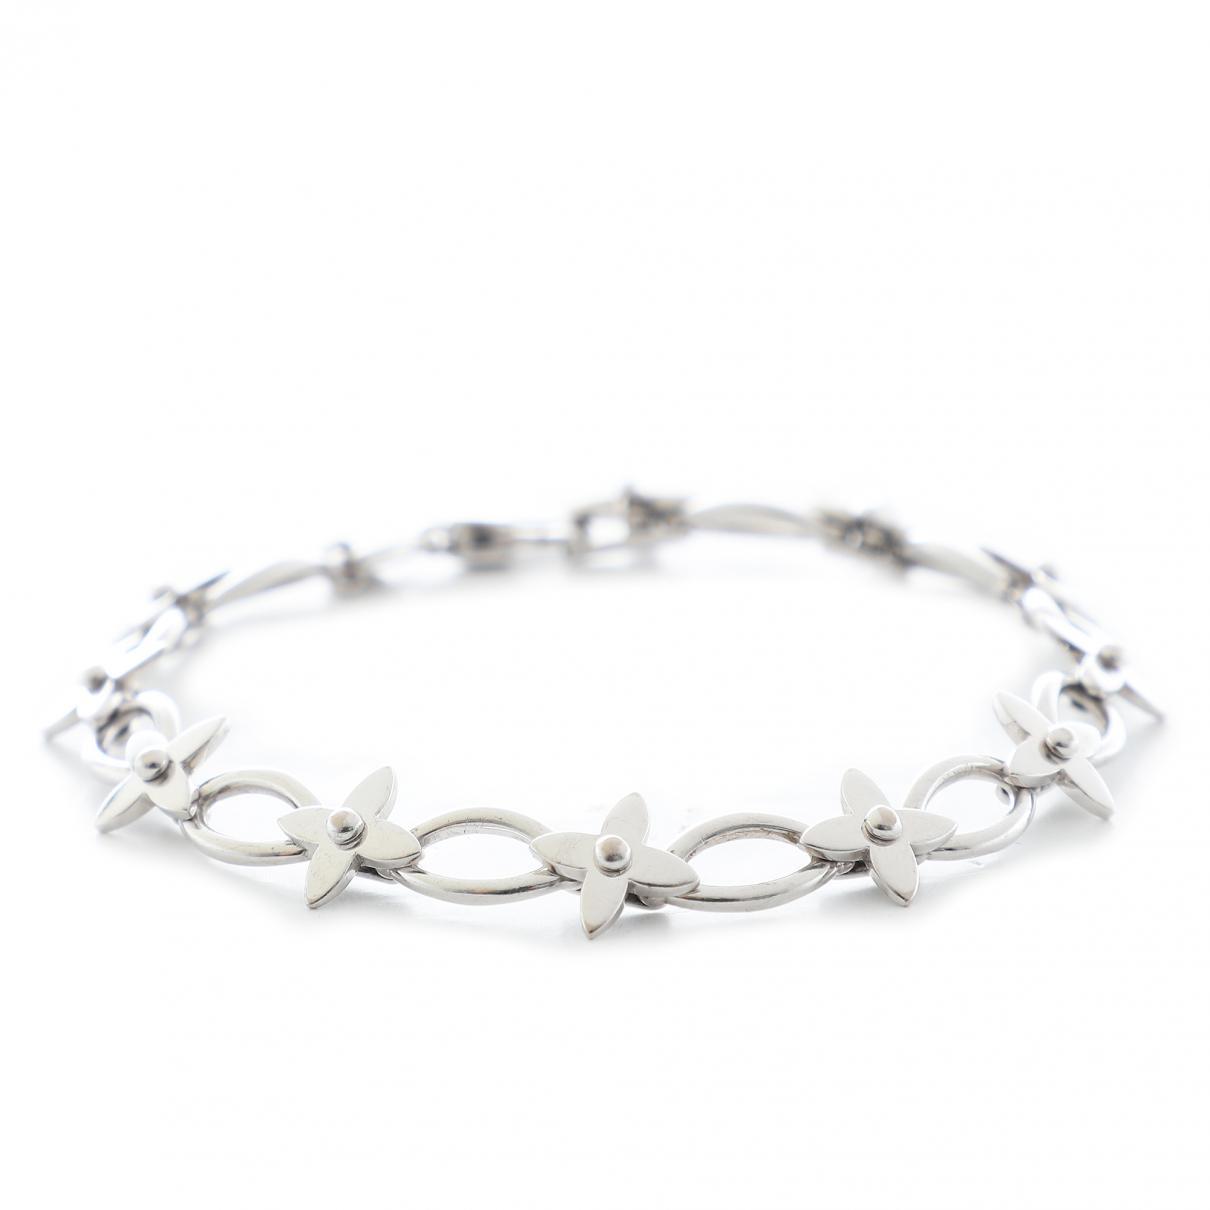 b59ef80598e7 Louis Vuitton - Metallic Idylle Blossom White Gold Bracelet - Lyst. View  fullscreen